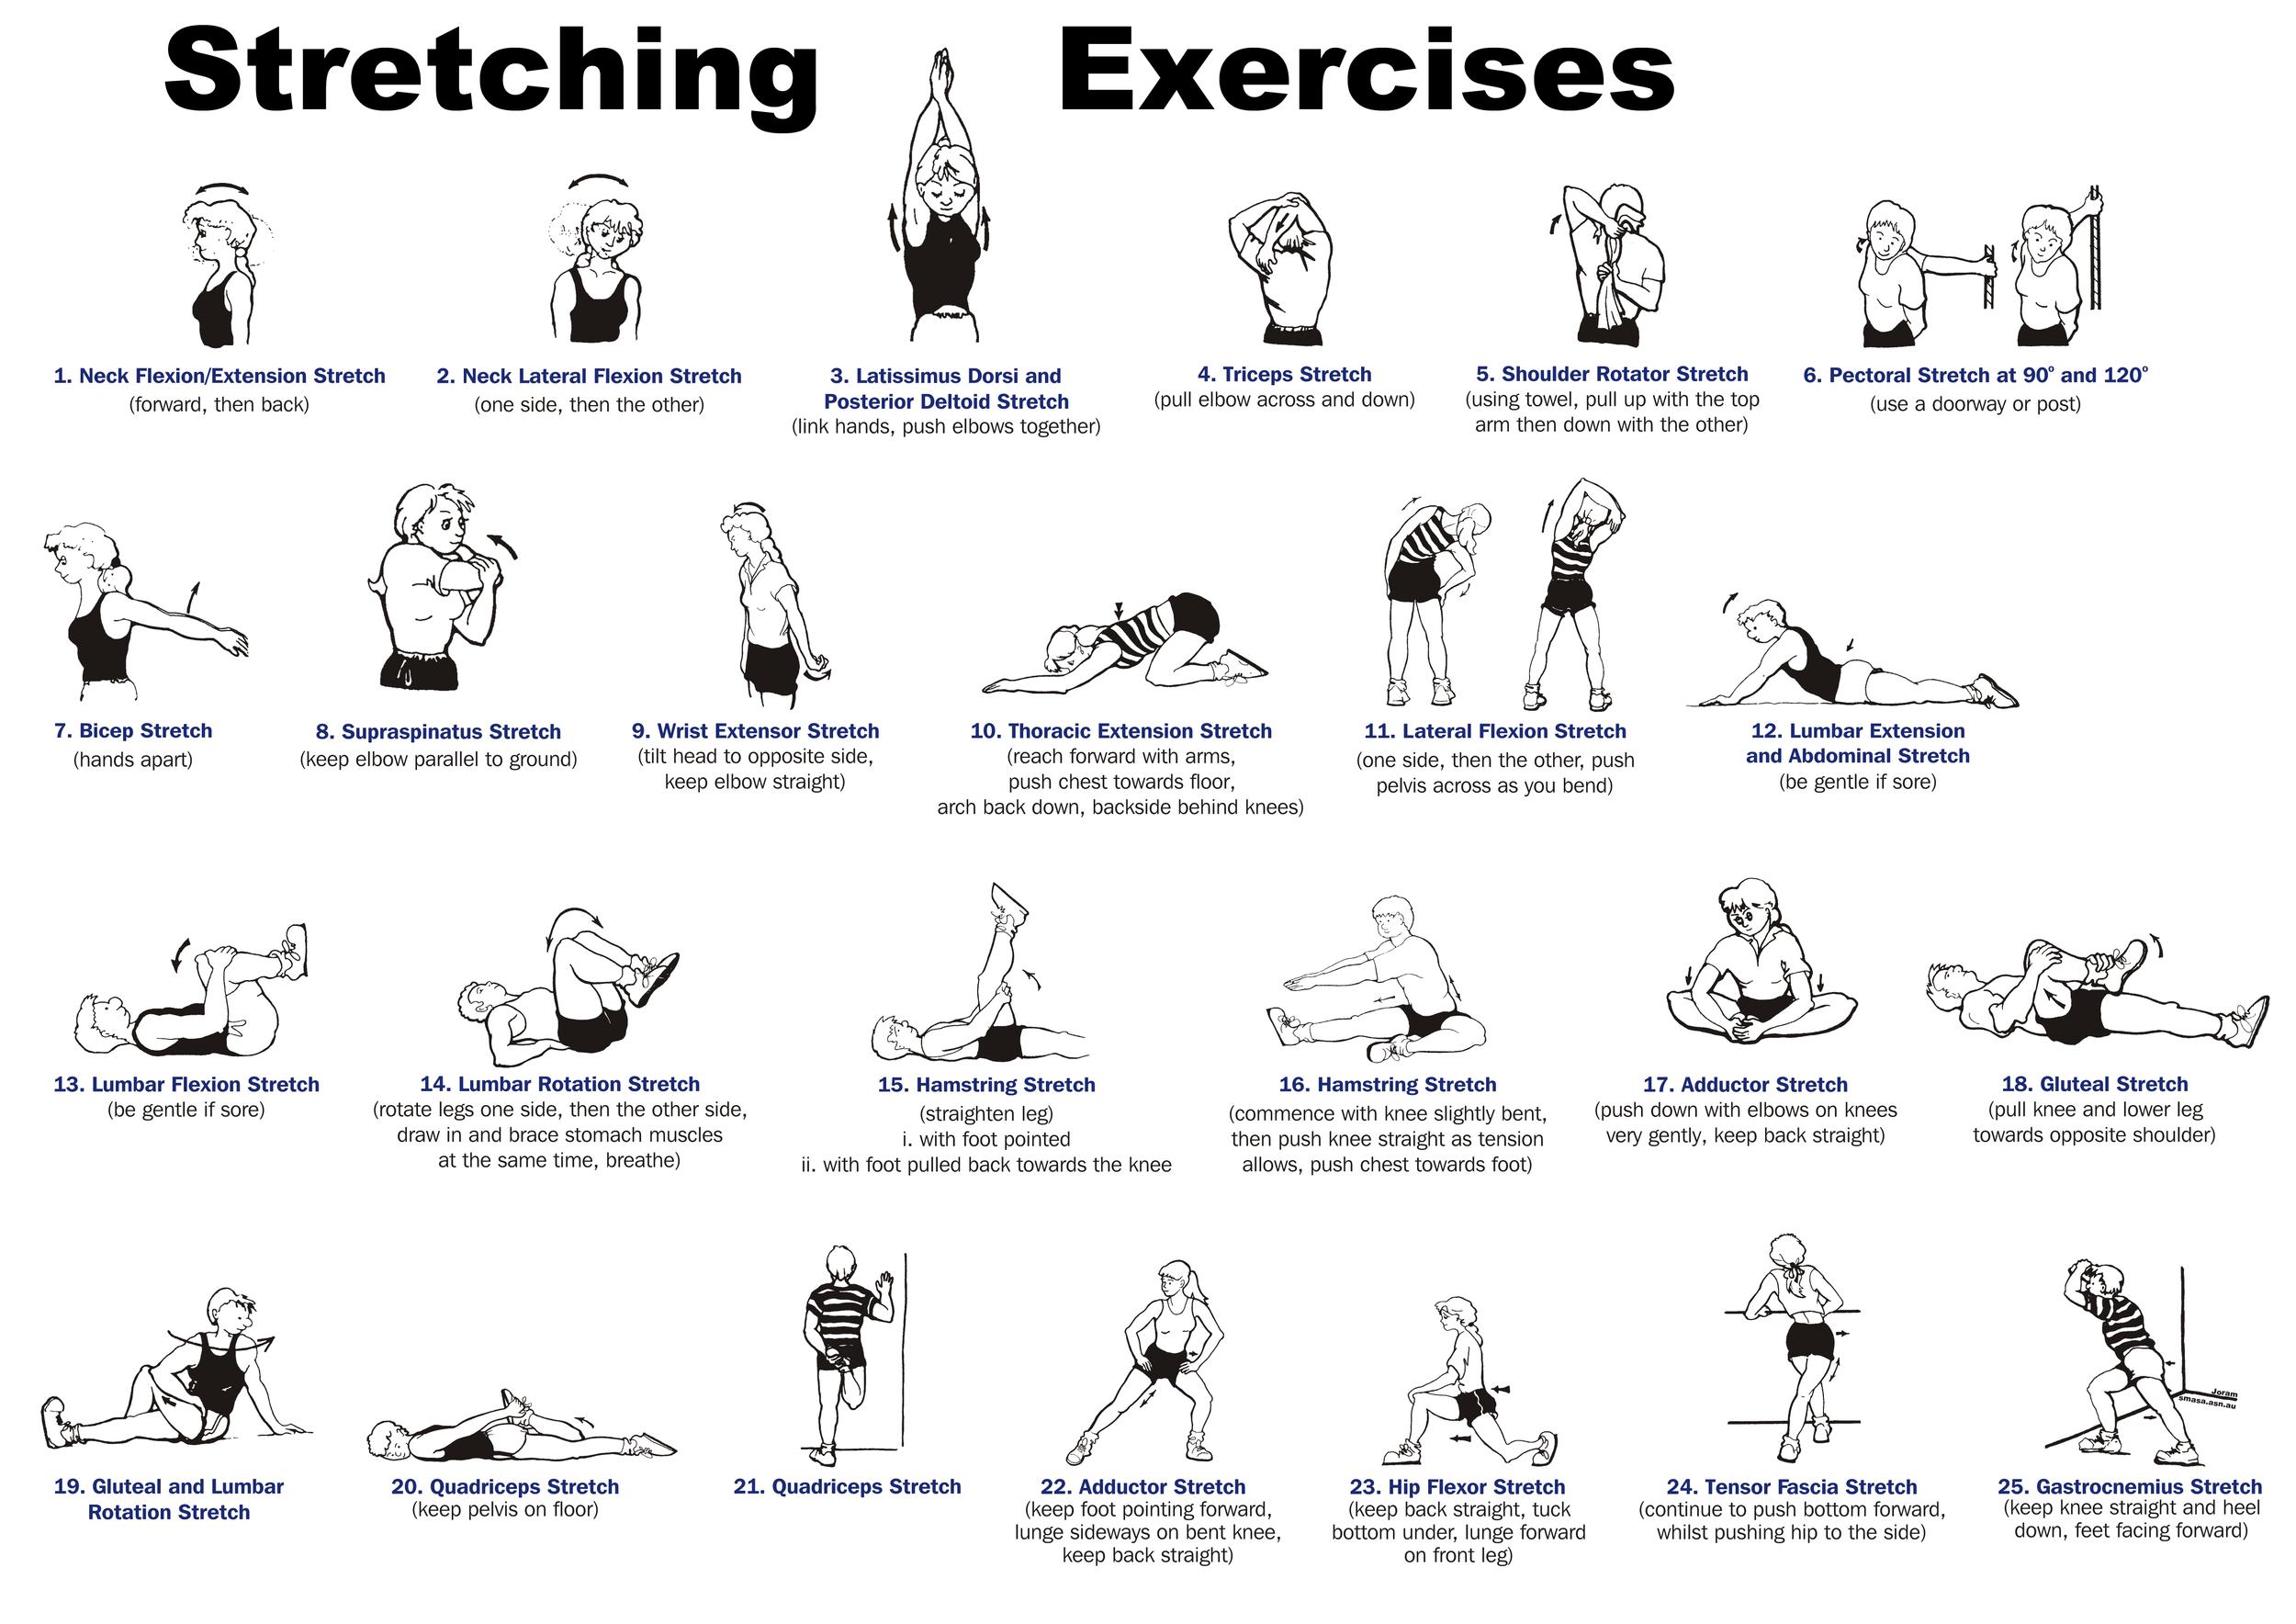 Photo Credit:http://dermalife.co.uk/shop/wp-content/uploads/2014/08/dermalife-stretching-exercise.png